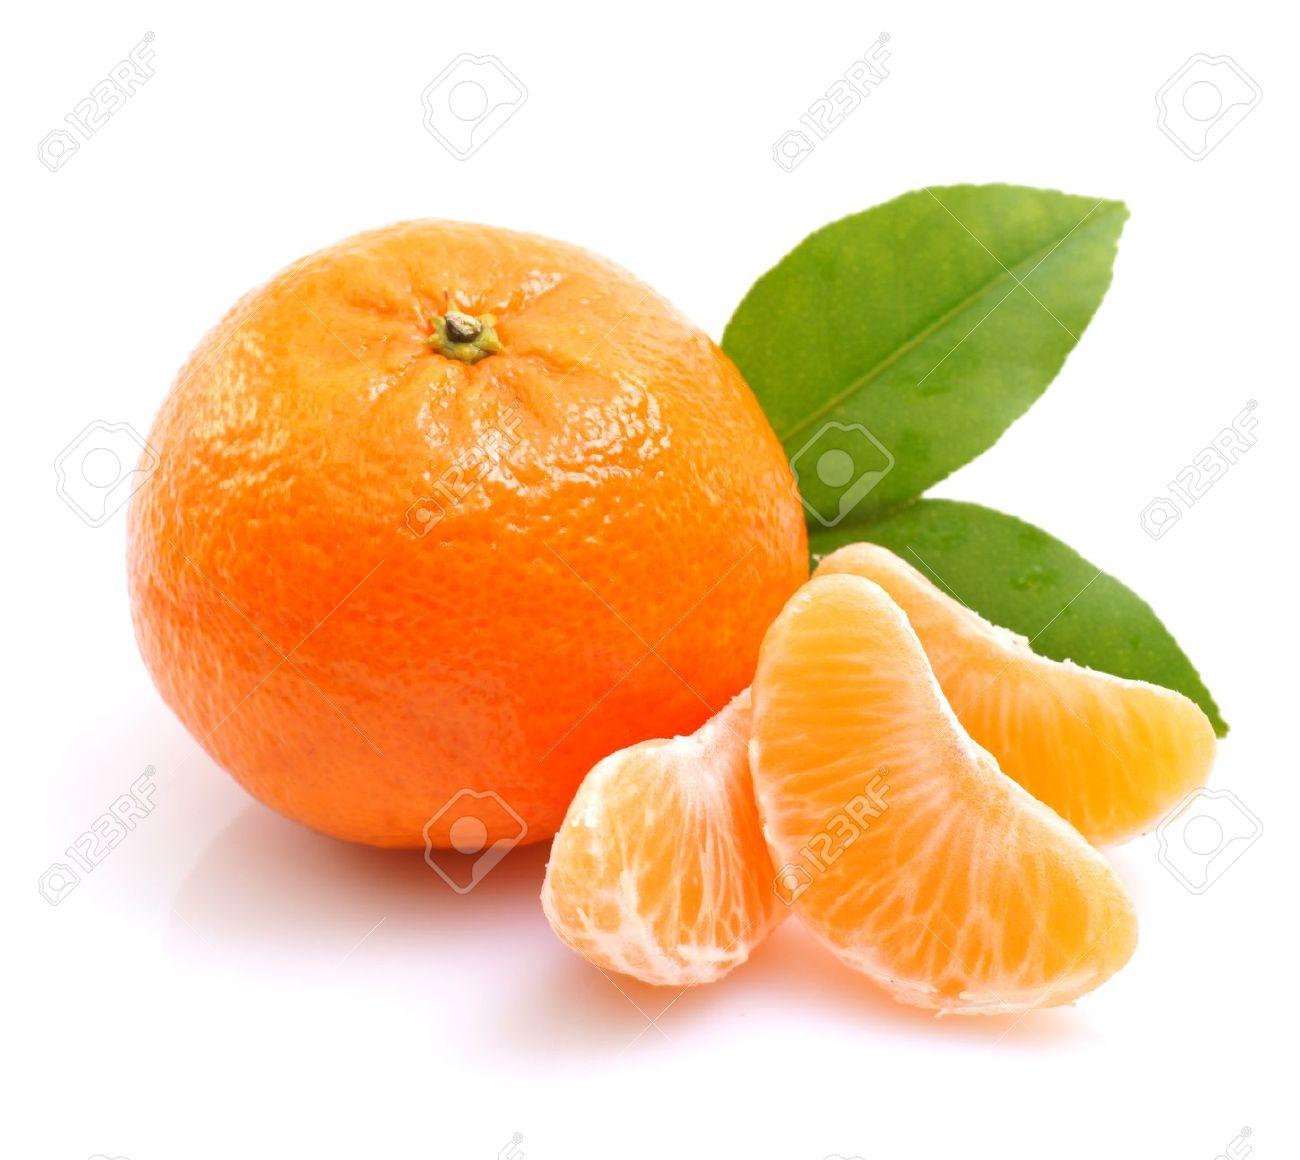 Mandarin Orange Stock Photo, Picture And Royalty Free Image. Image ...